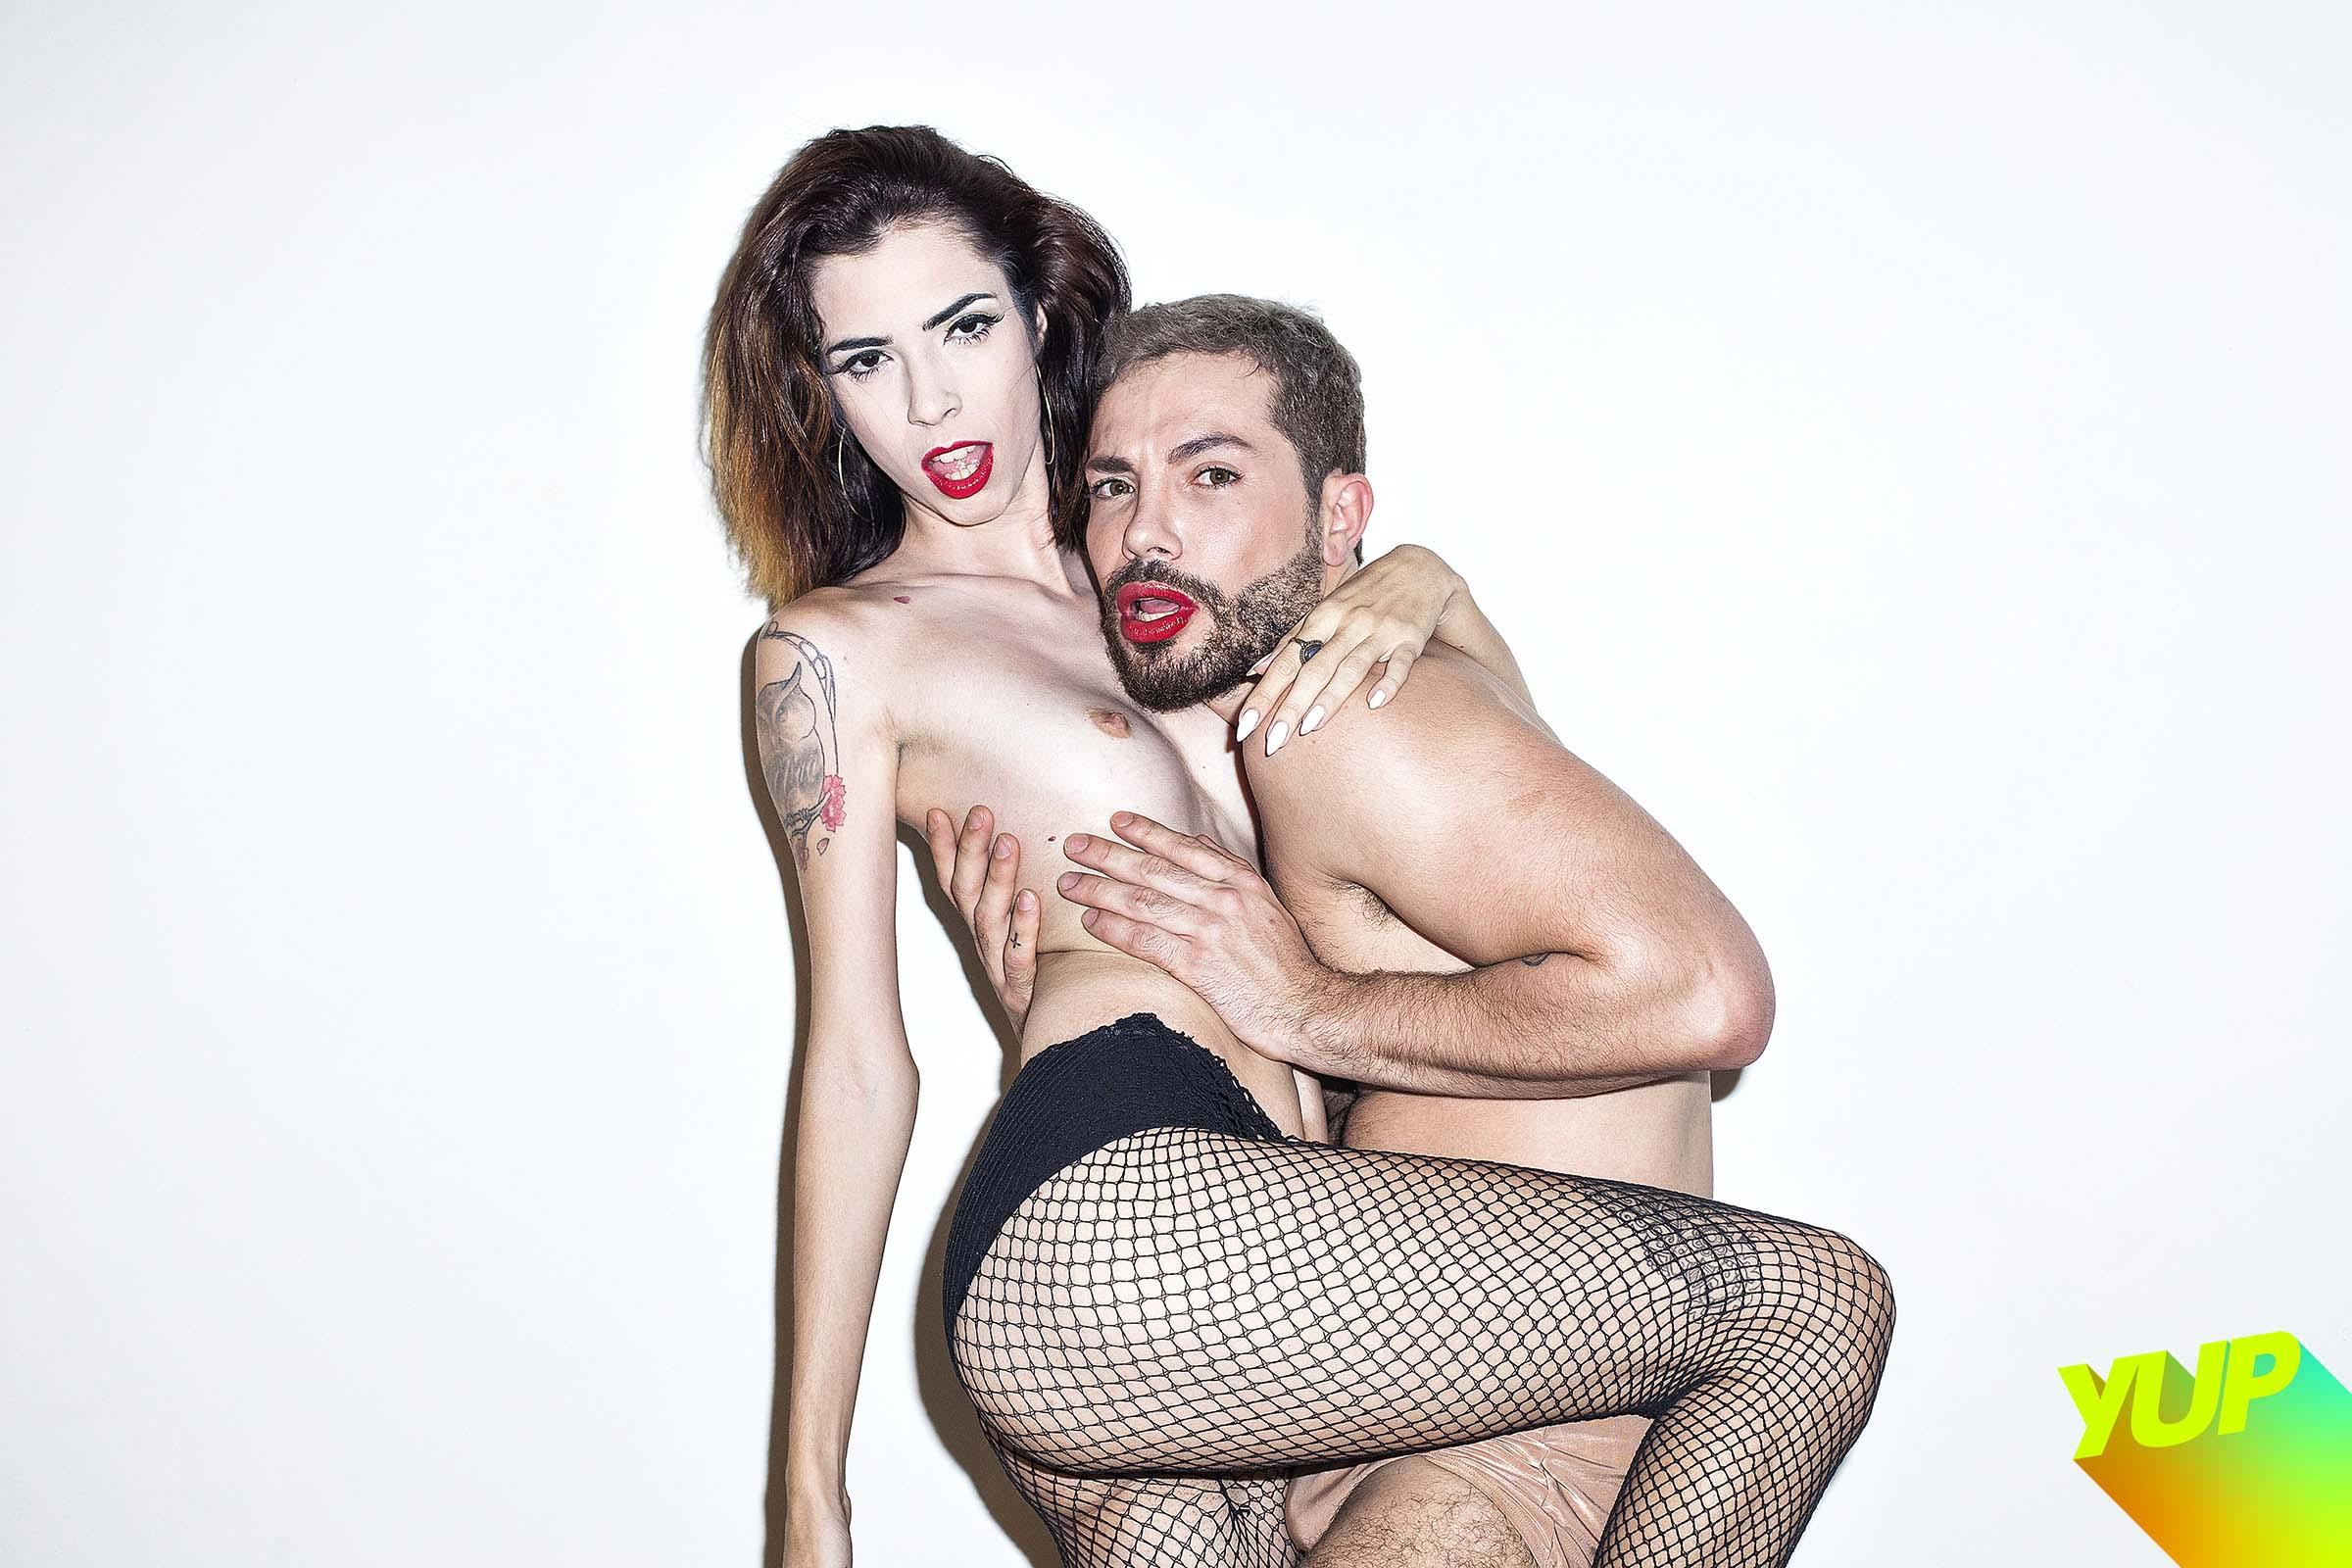 Davi Alvarez & Alex Almeida feat. Anna Veloso X Emerson Muniz